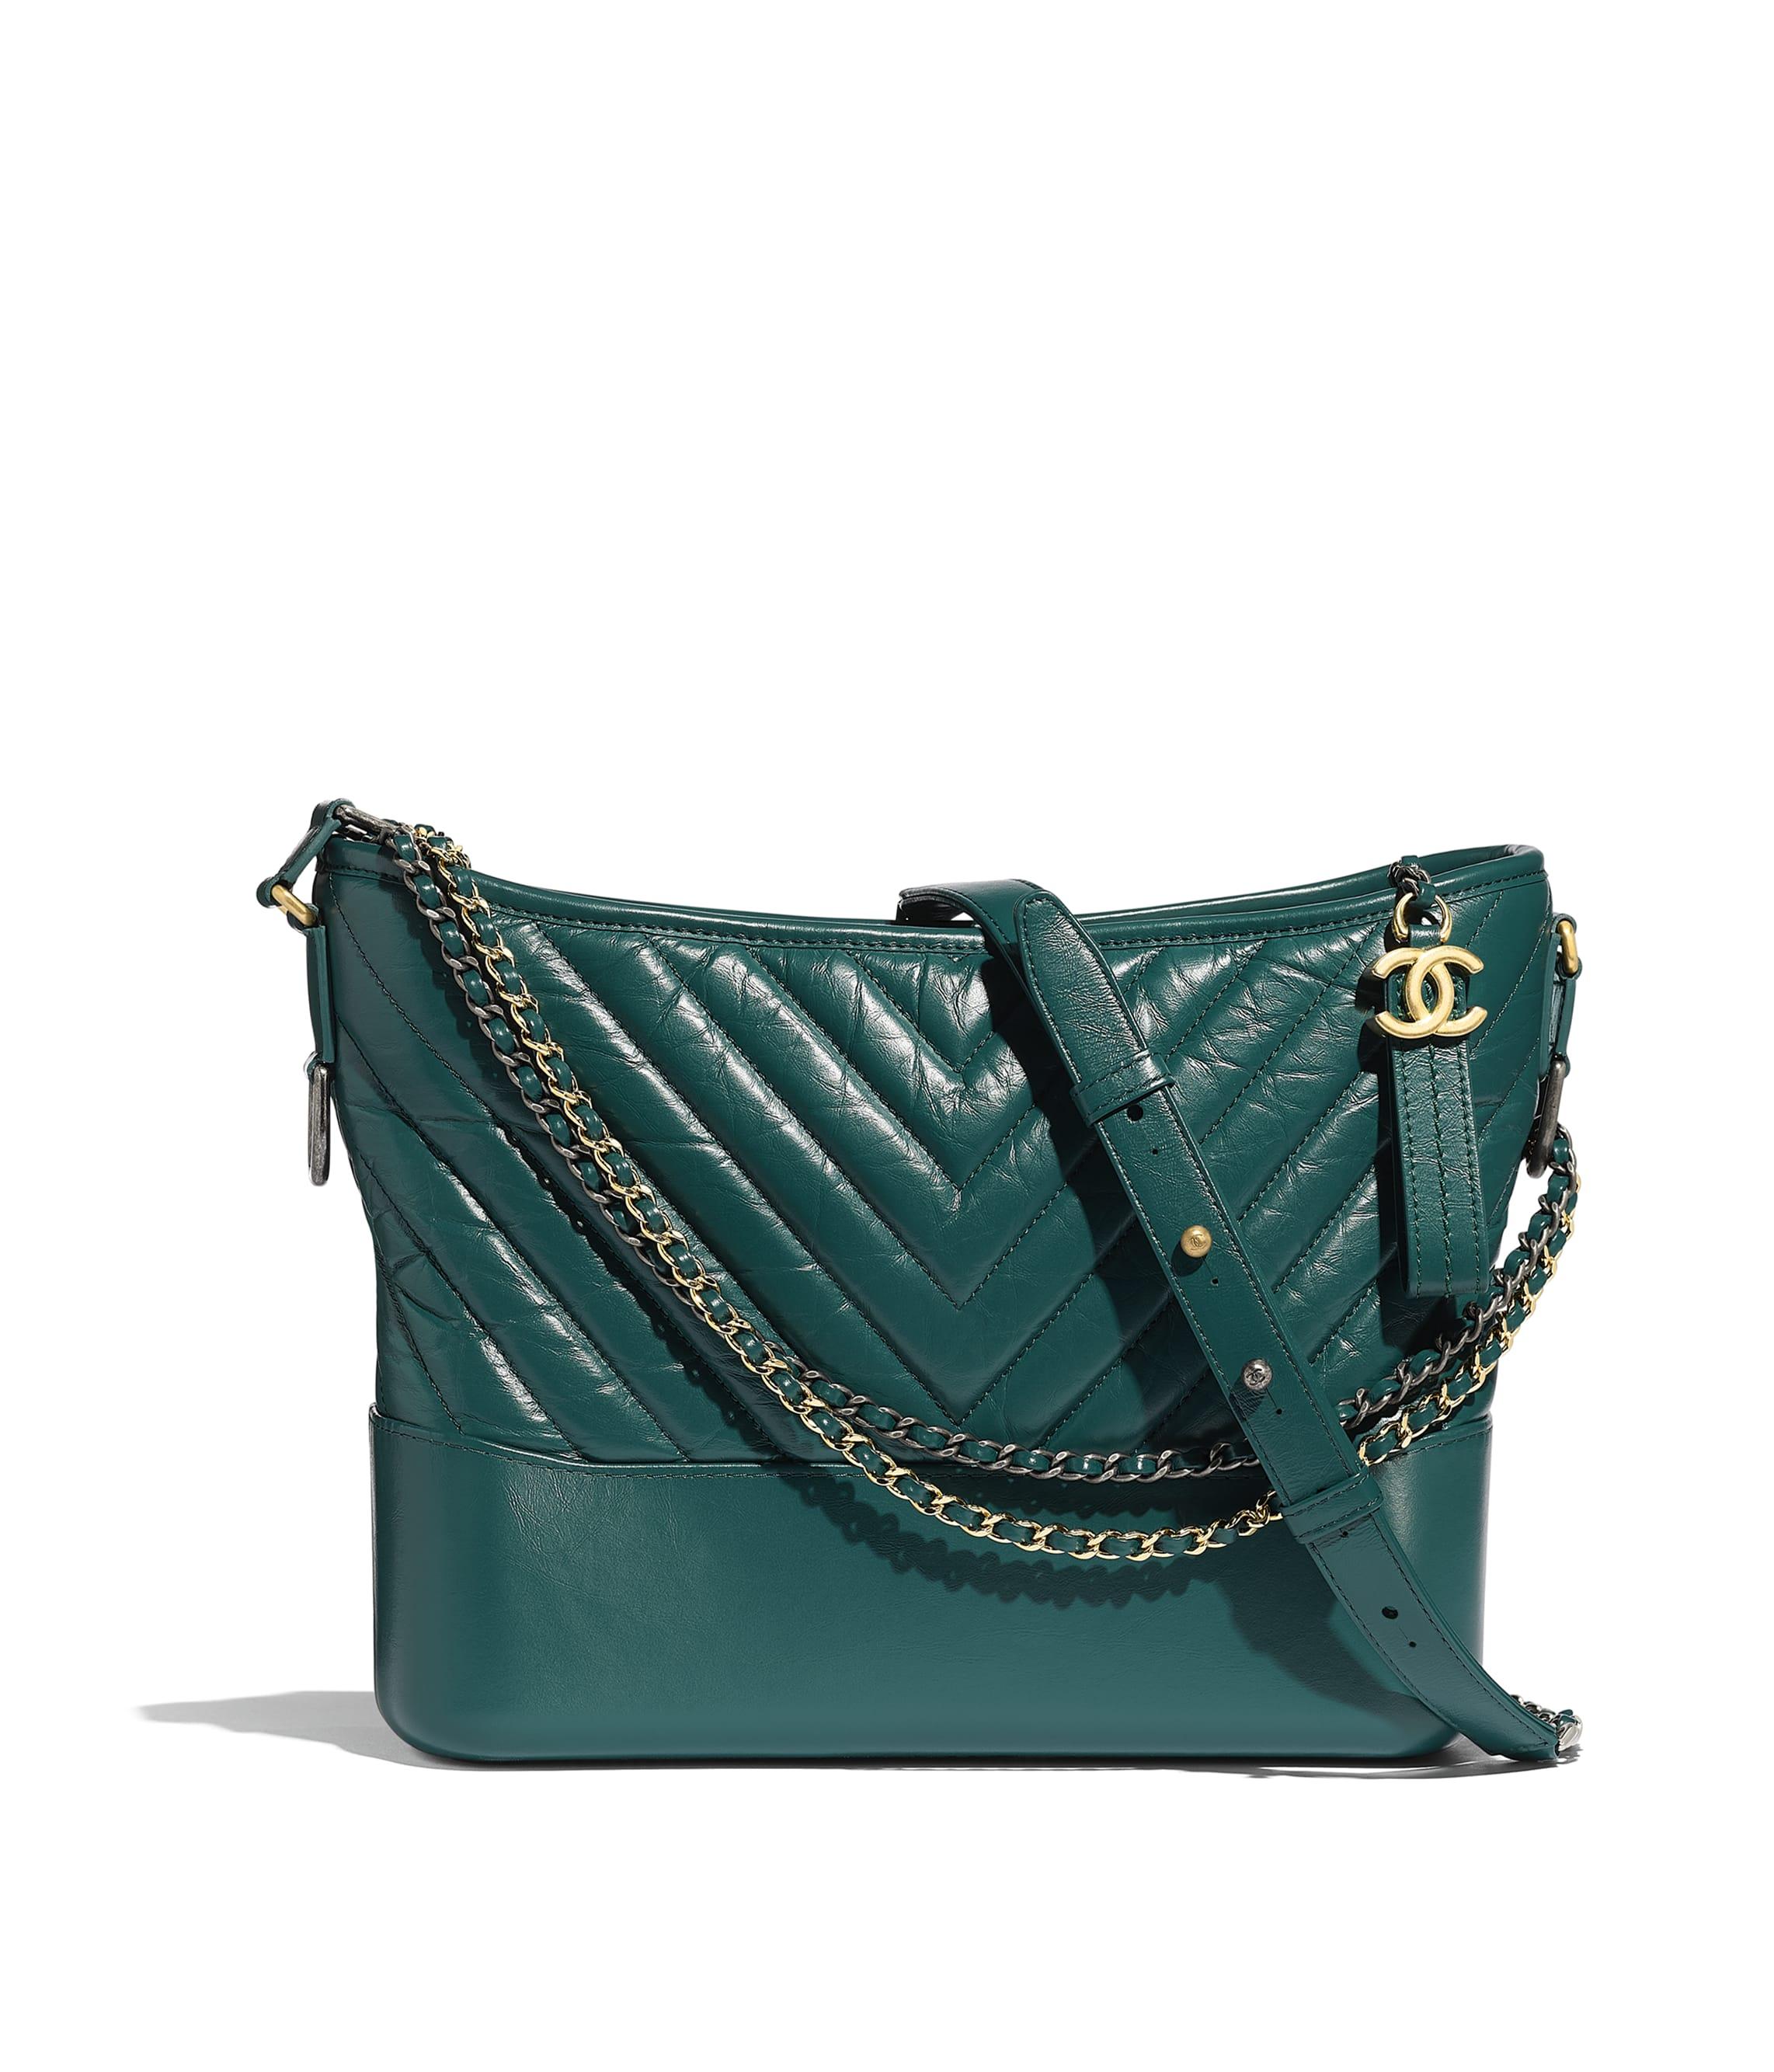 7912de4b9bc3 CHANEL'S GABRIELLE Hobo Bag, aged calfskin, smooth calfskin, gold ...